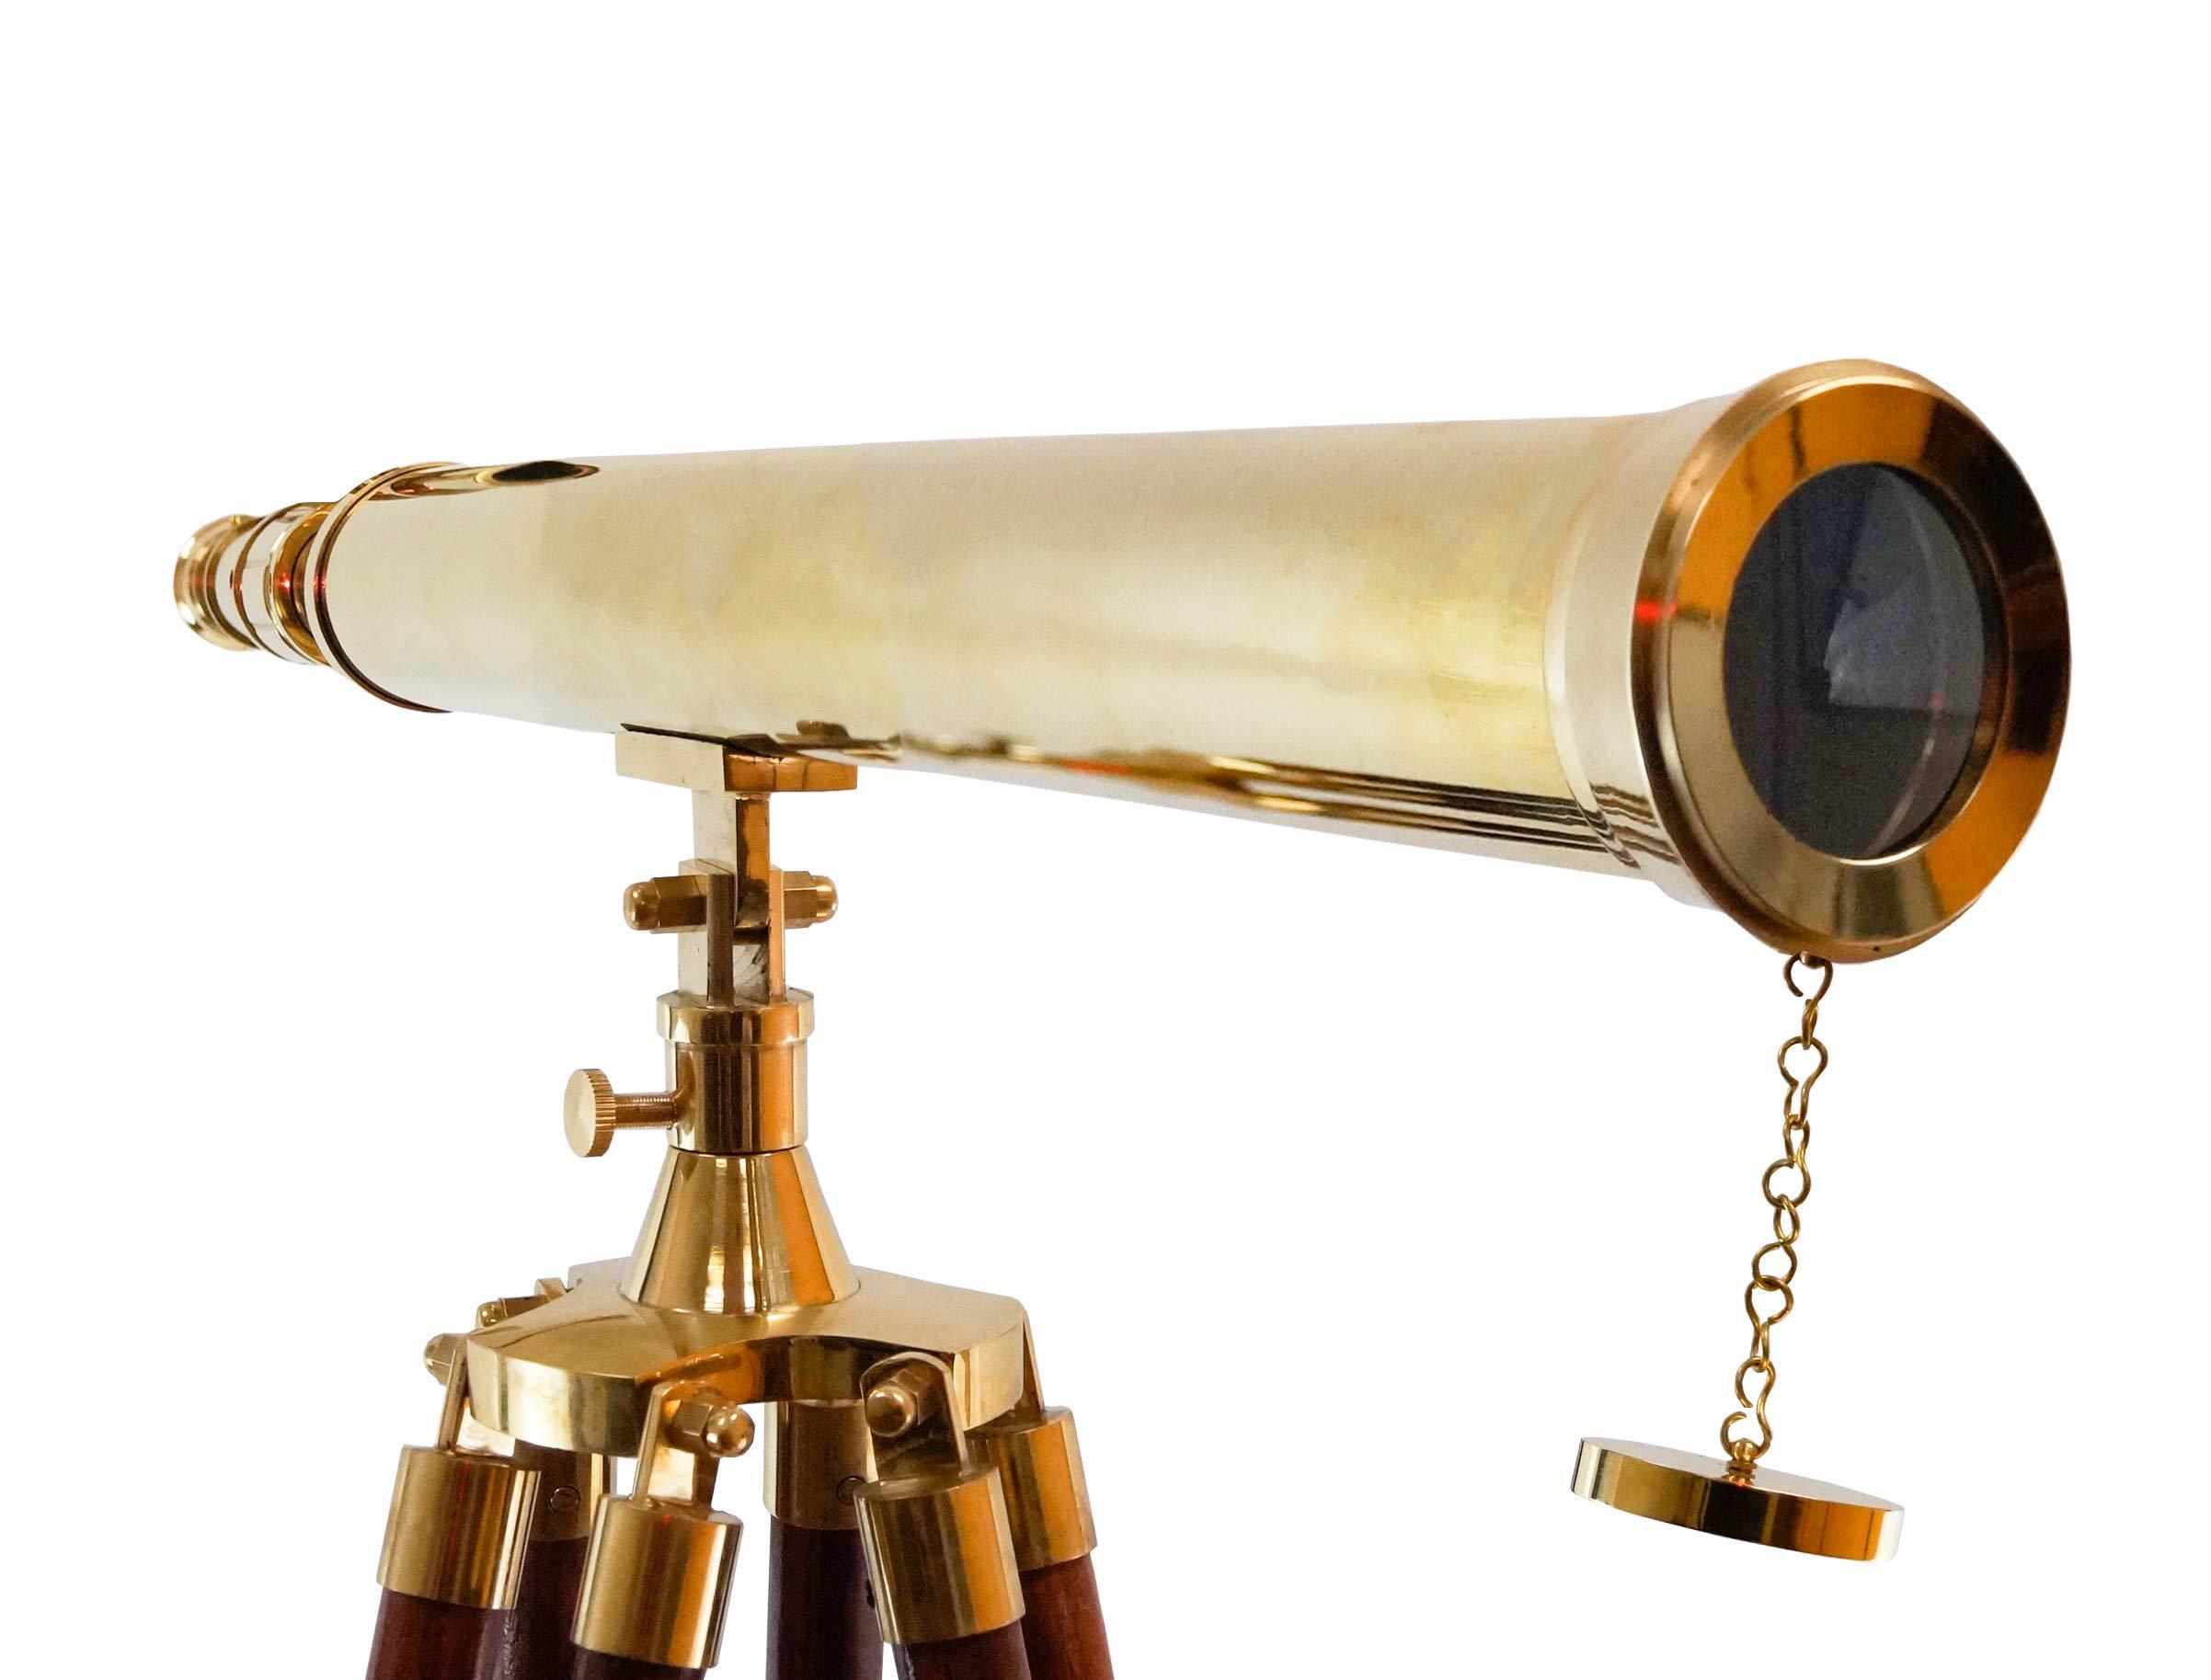 Nautical Collection's 64'' Decorative Floor Standing Tripod Brass Telescope Adjustable Size Sky Watcher (Harbor Master Telescope)